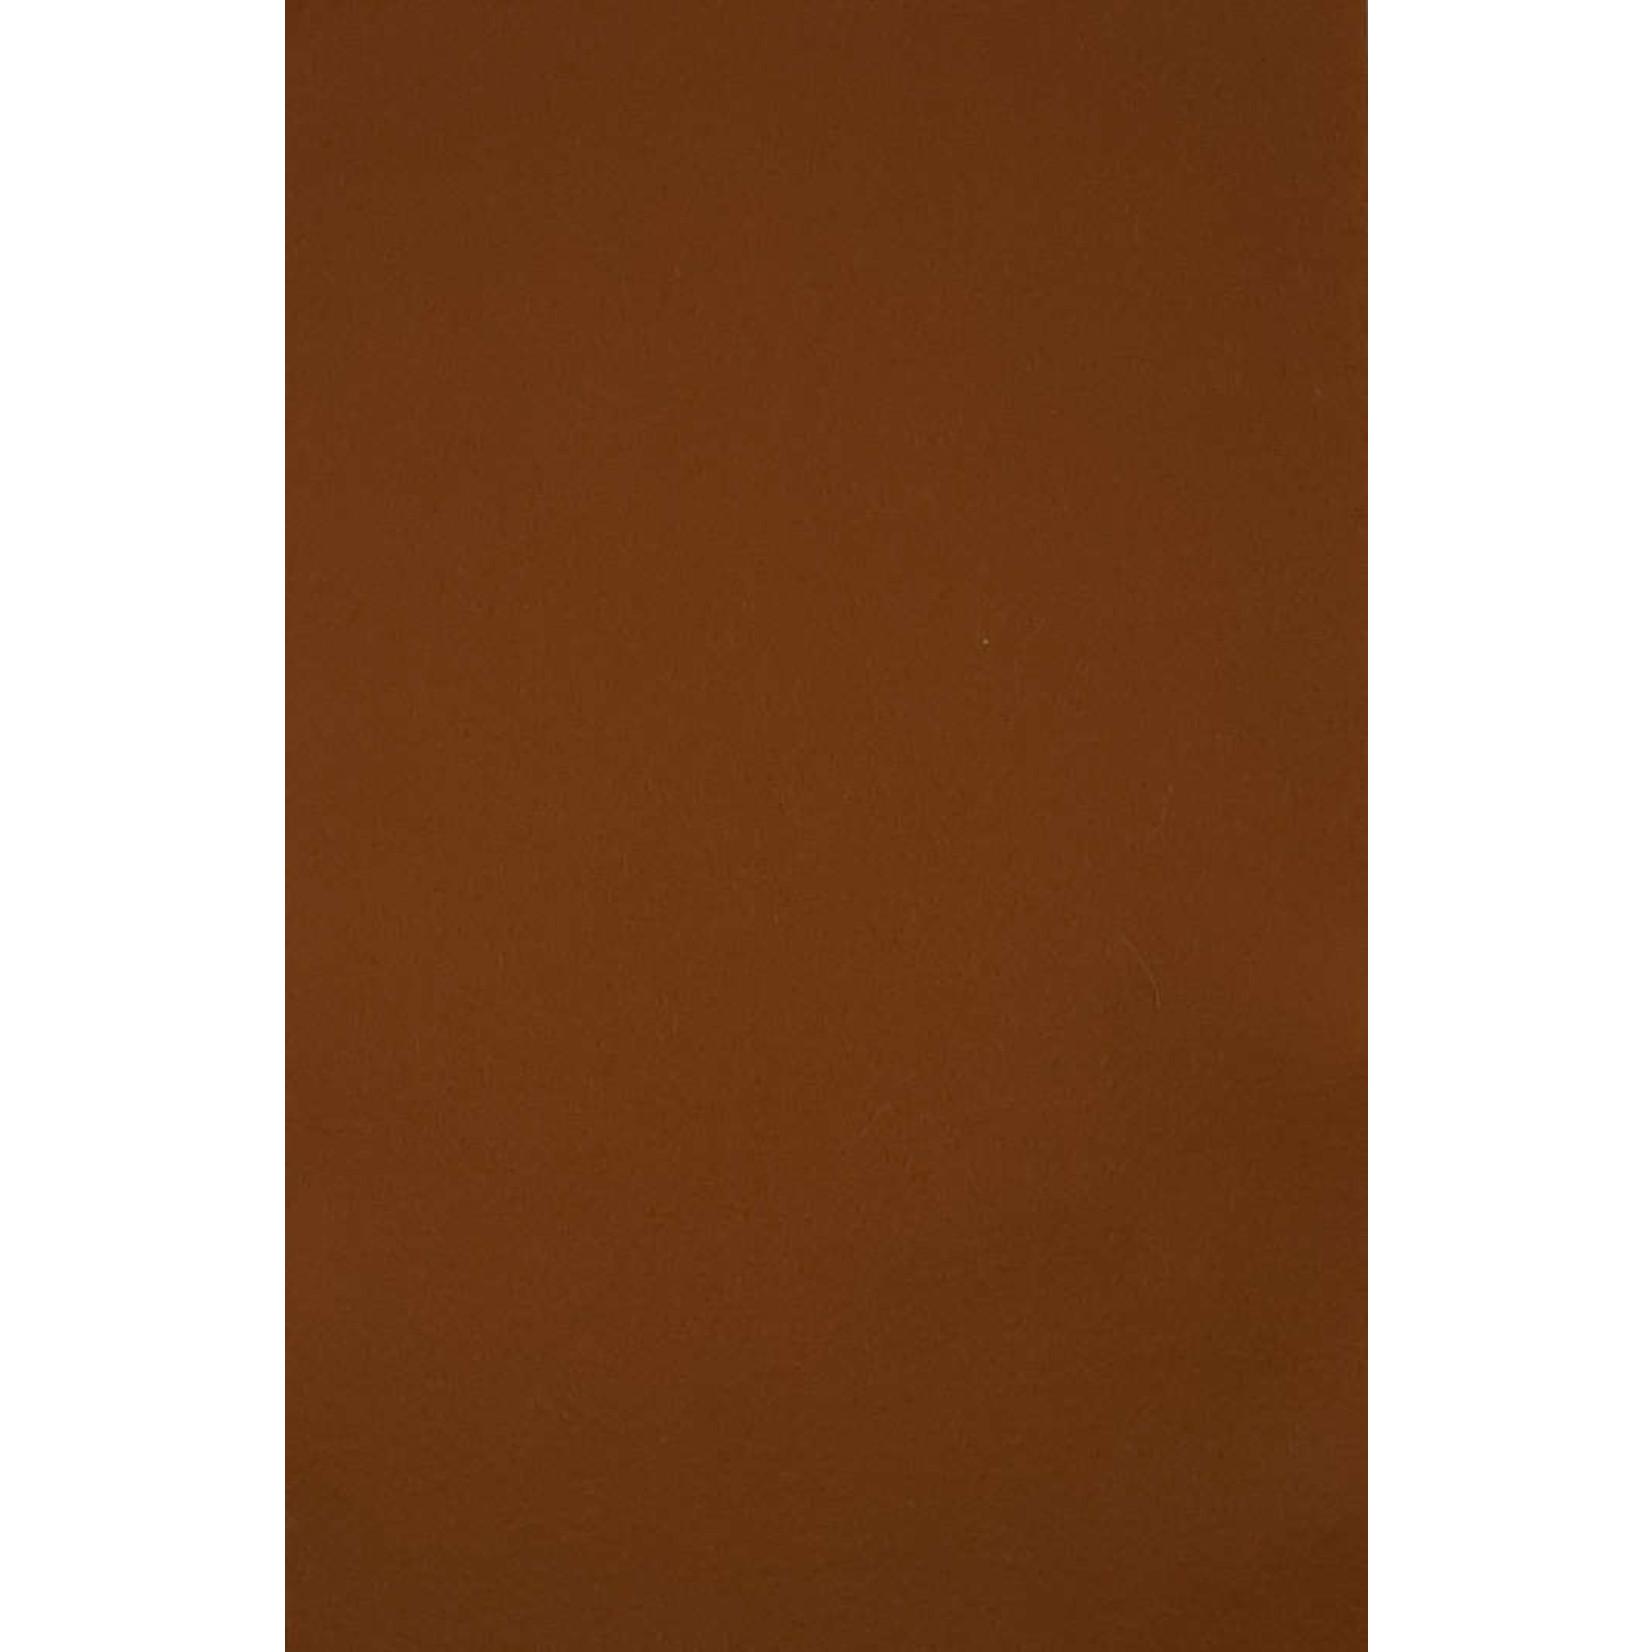 HollandFelt Wolvilt - lapje 20 x 30 cm. - kleur 15 - Suedebruin - zuiver scheerwol- 1 mm. dik